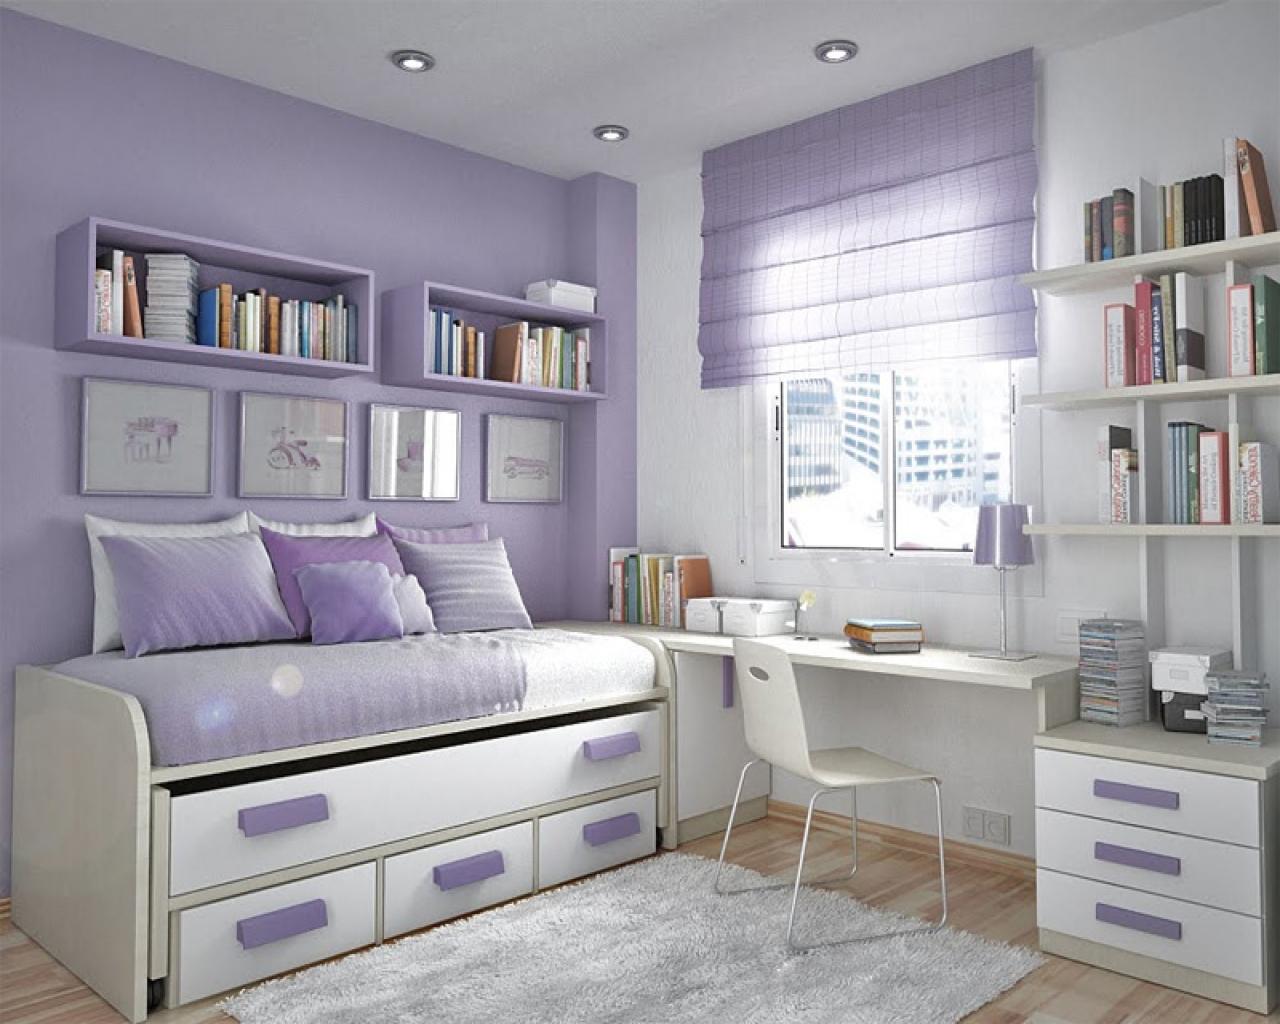 Daybed Comforter Sets For Girls Ideas On Foter